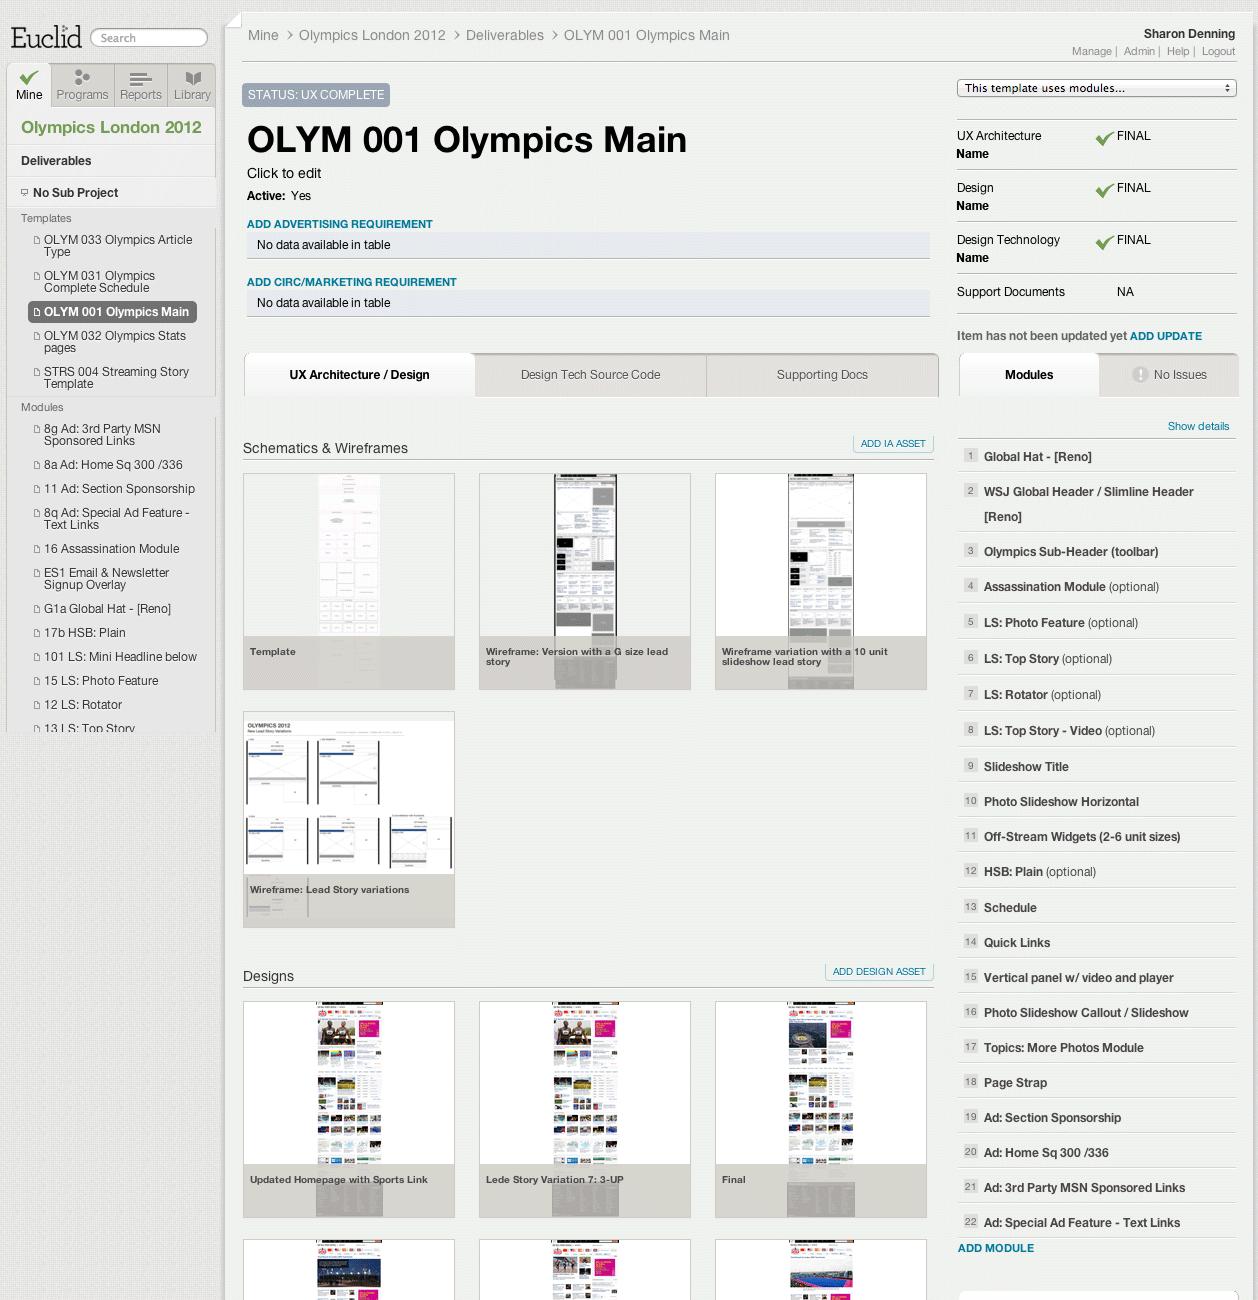 etemp_1_OLYM-001-Olympics-Main